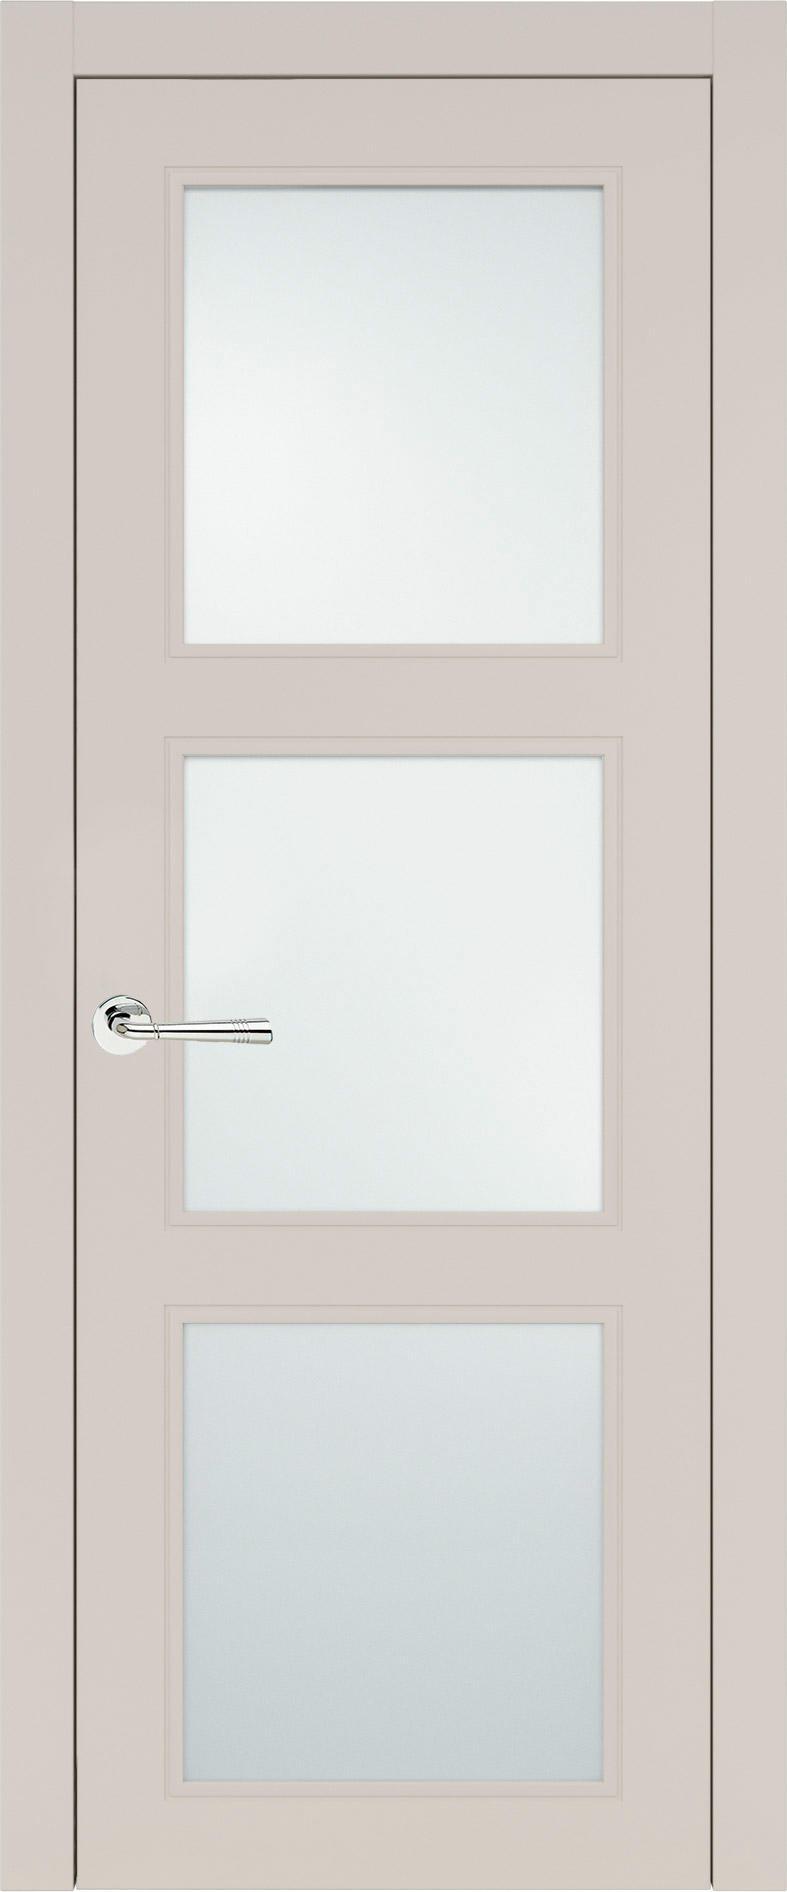 Milano Neo Classic цвет - Жемчужная эмаль (RAL 1013) Со стеклом (ДО)